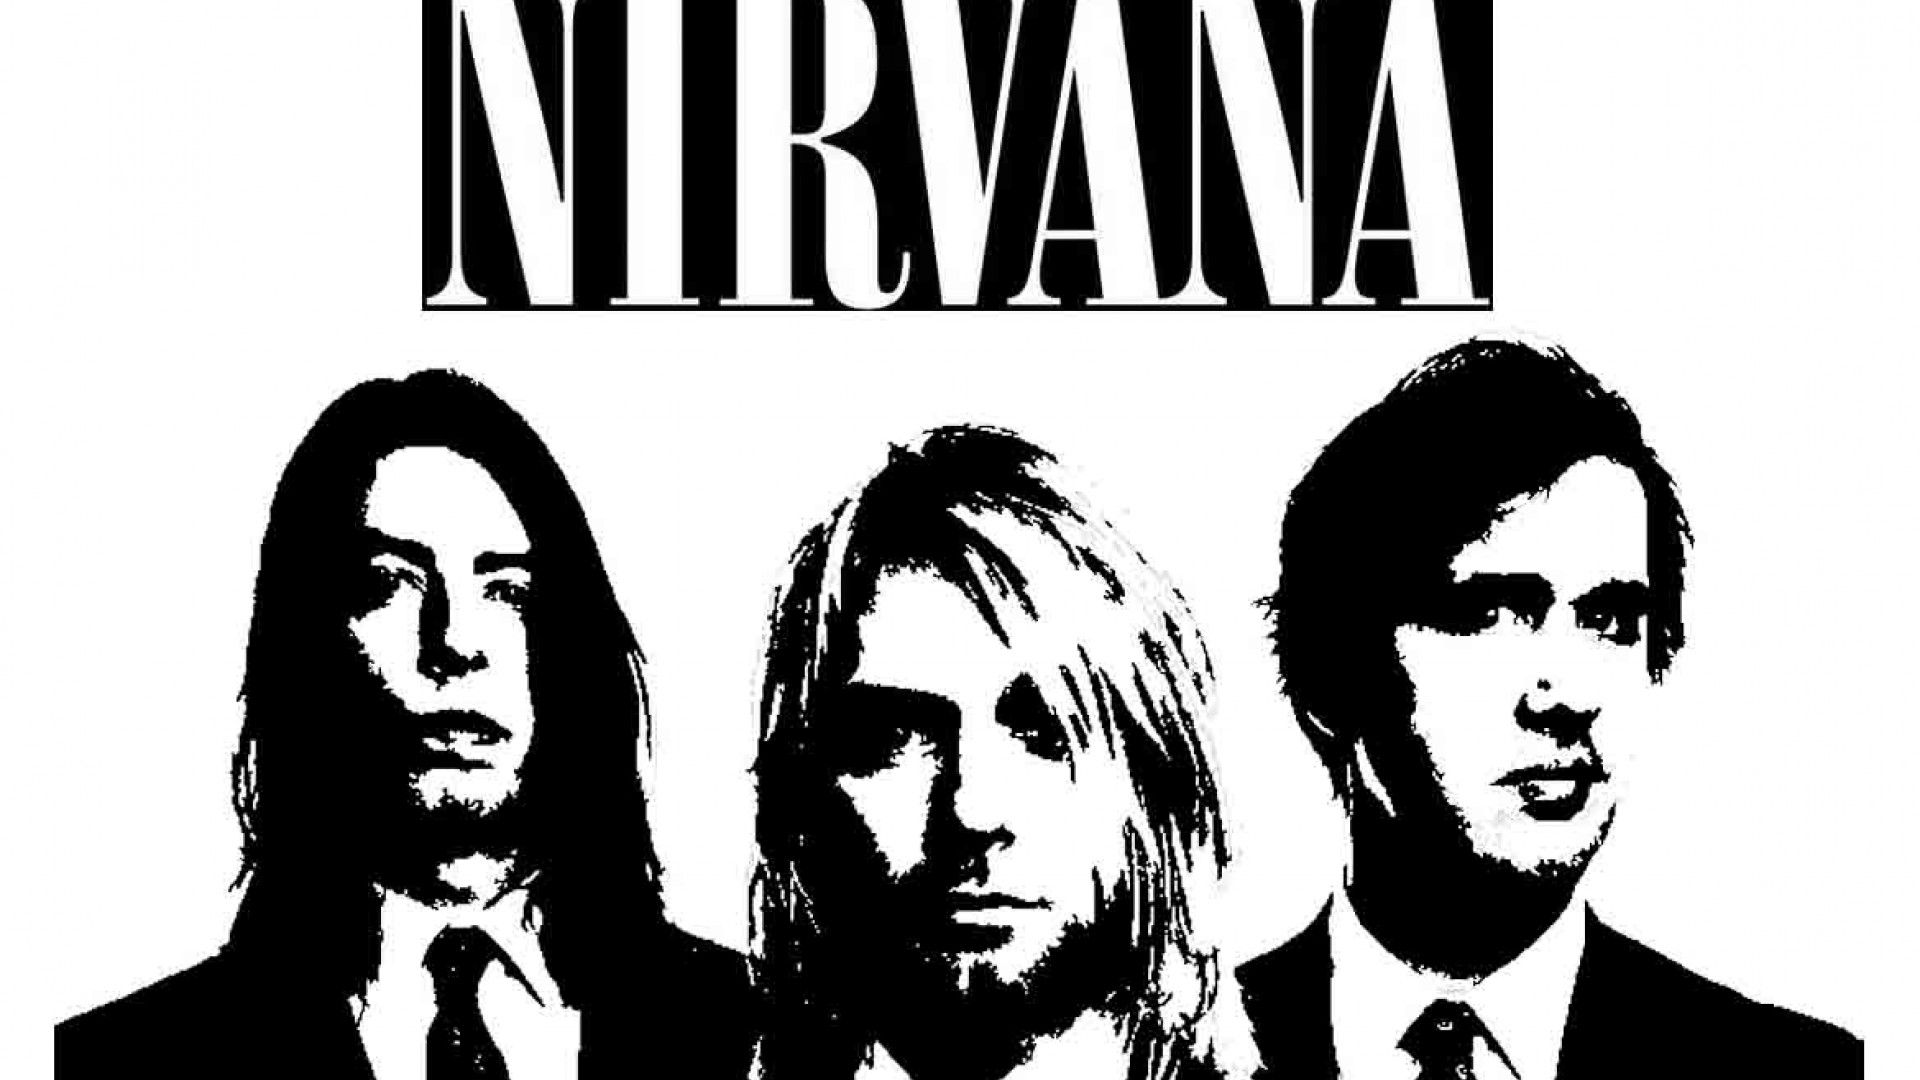 Nirvana Wallpaper 18 1920x1080